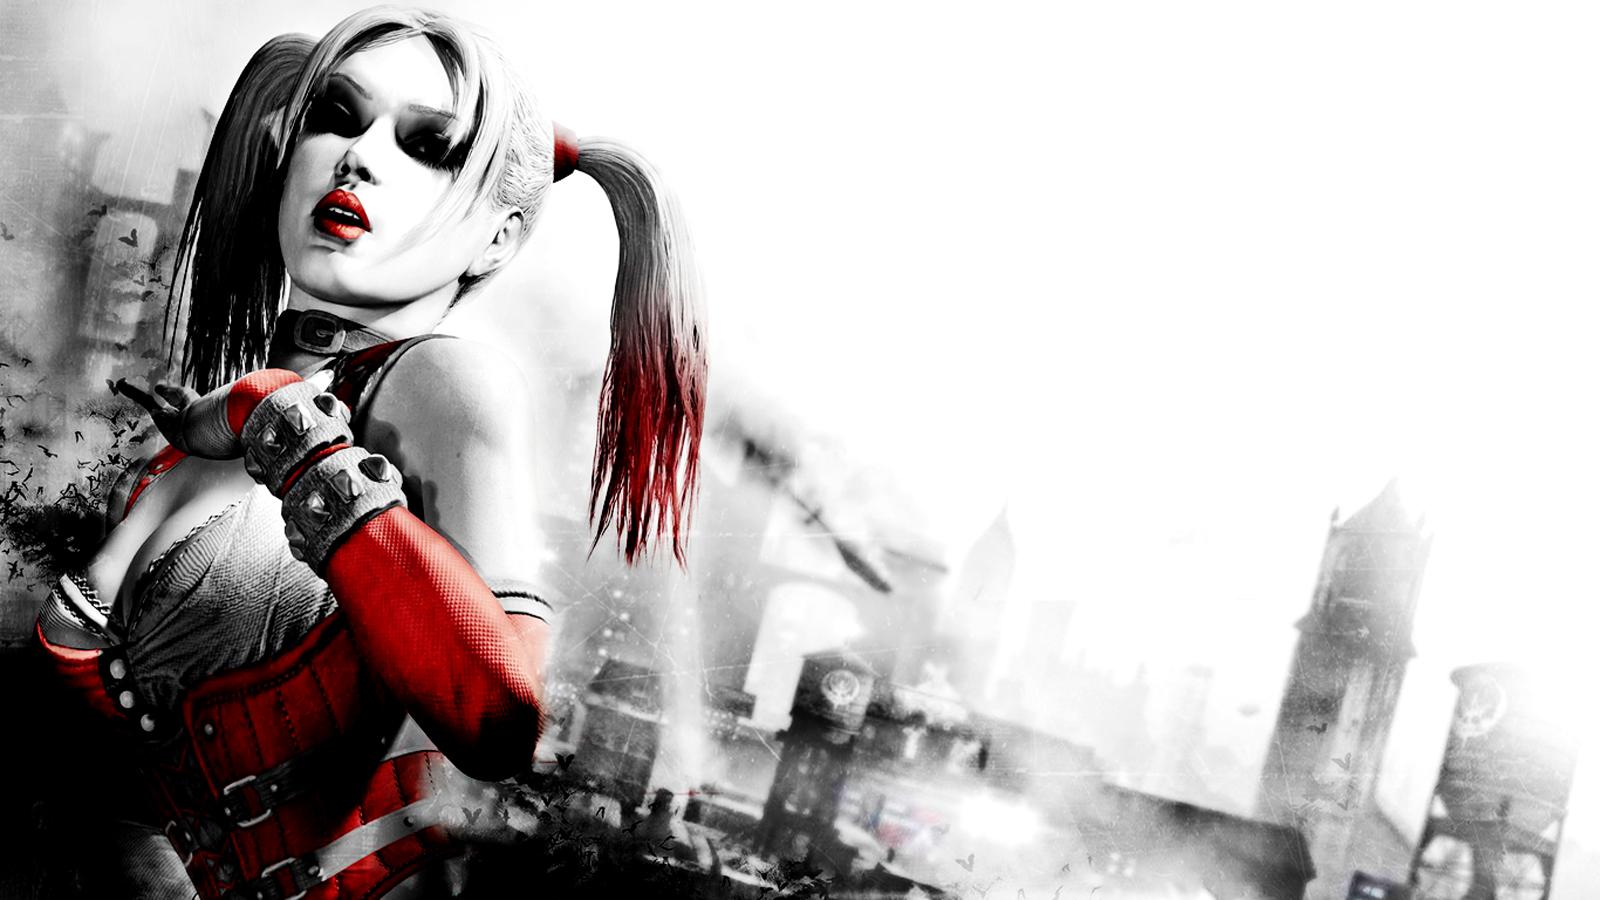 pic new posts: Wallpaper Hd Harley Quinn